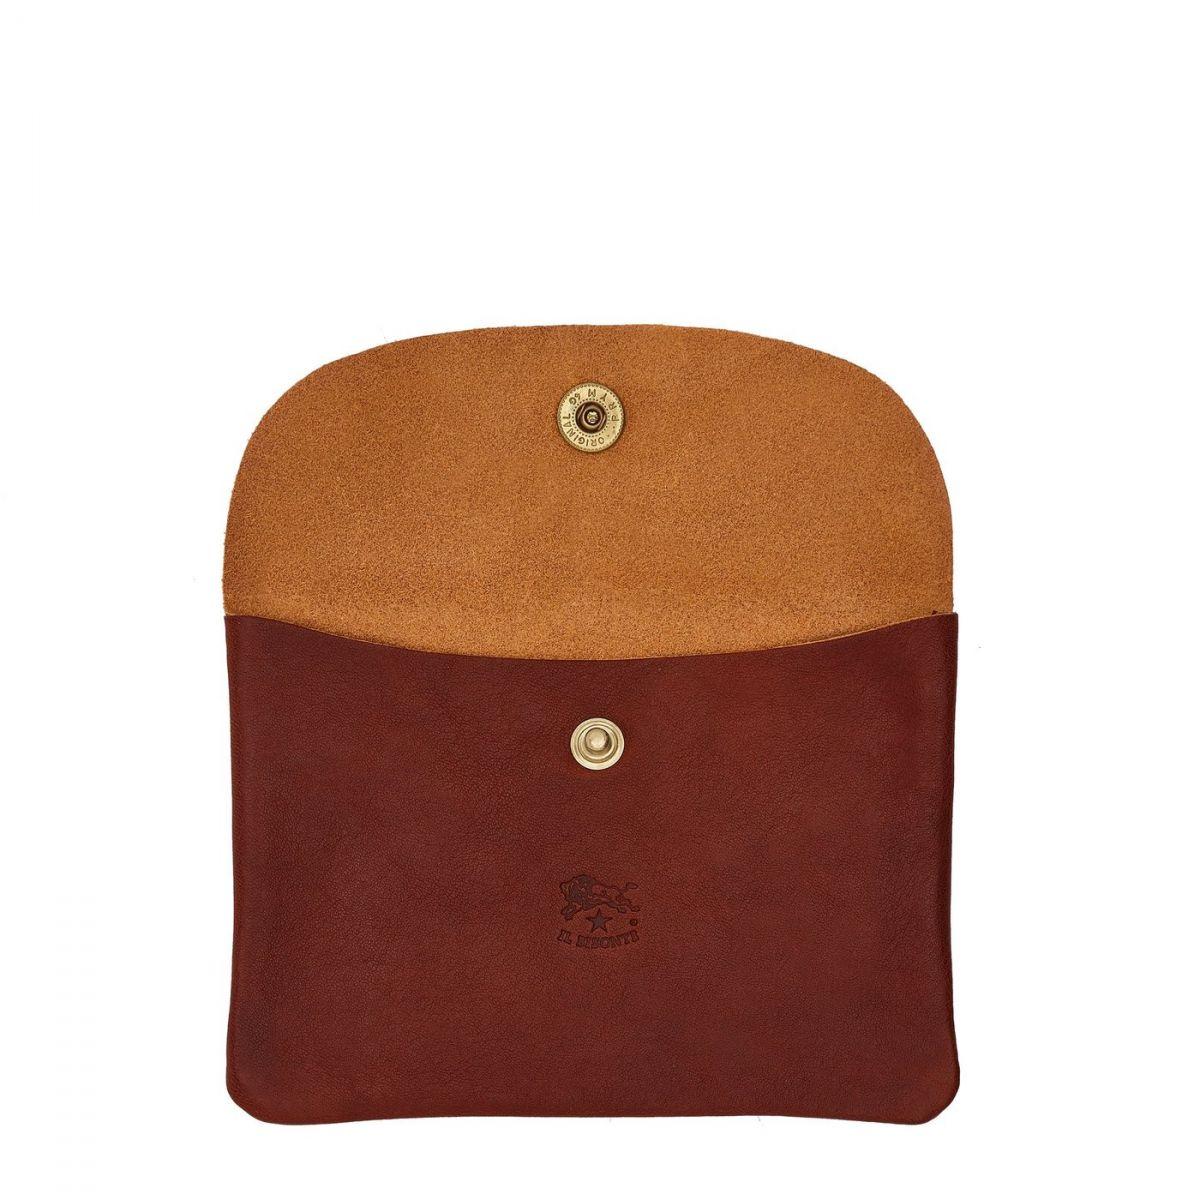 Case in Vintage Cowhide Leather SCA008 color Dark Brown Seppia | Details